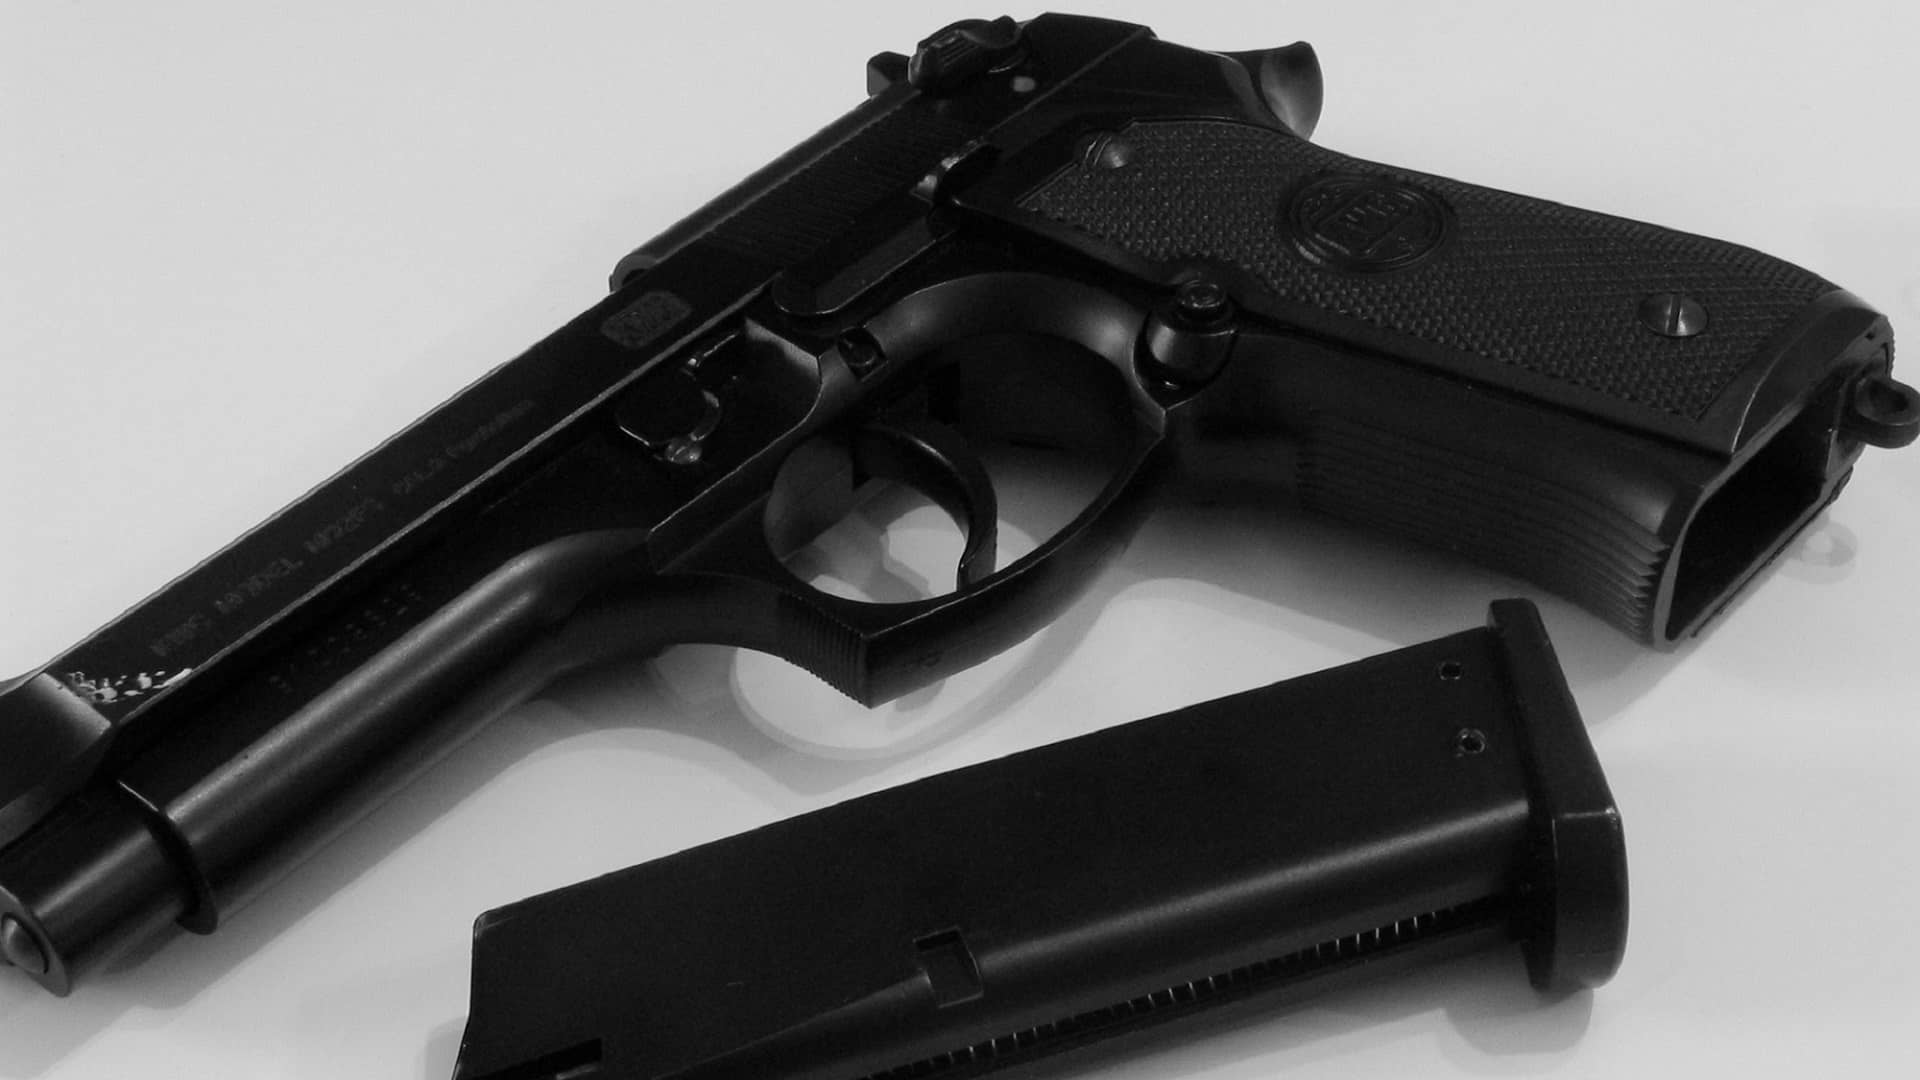 Bill requiring state permit to buy handgun clears committee